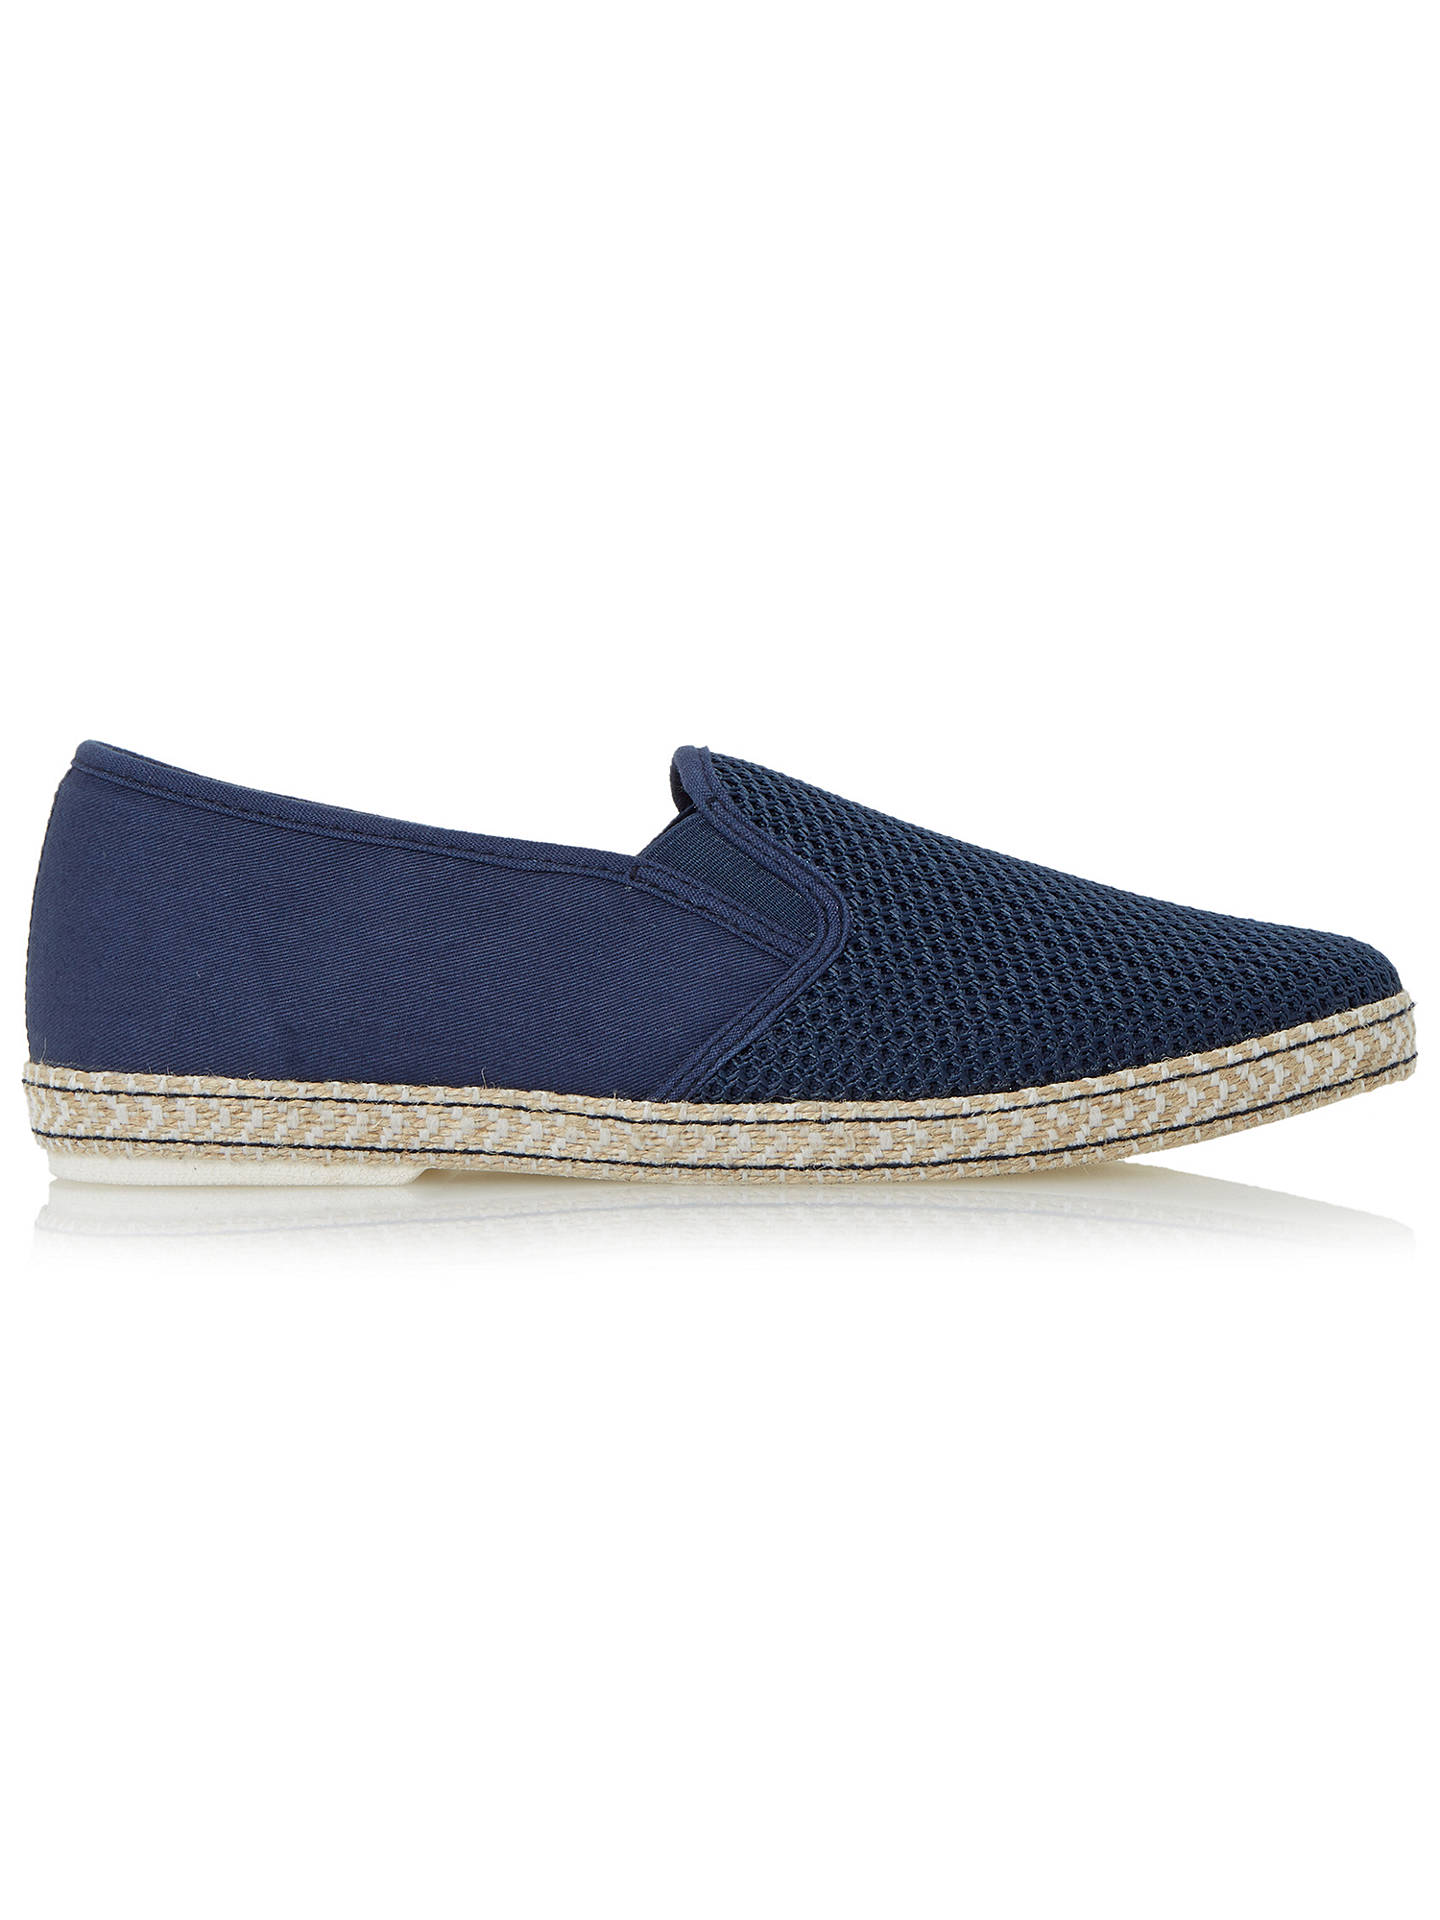 d4b113c4266b BuyDune Fencing Mesh Vamp Slip-On Espadrille Shoes